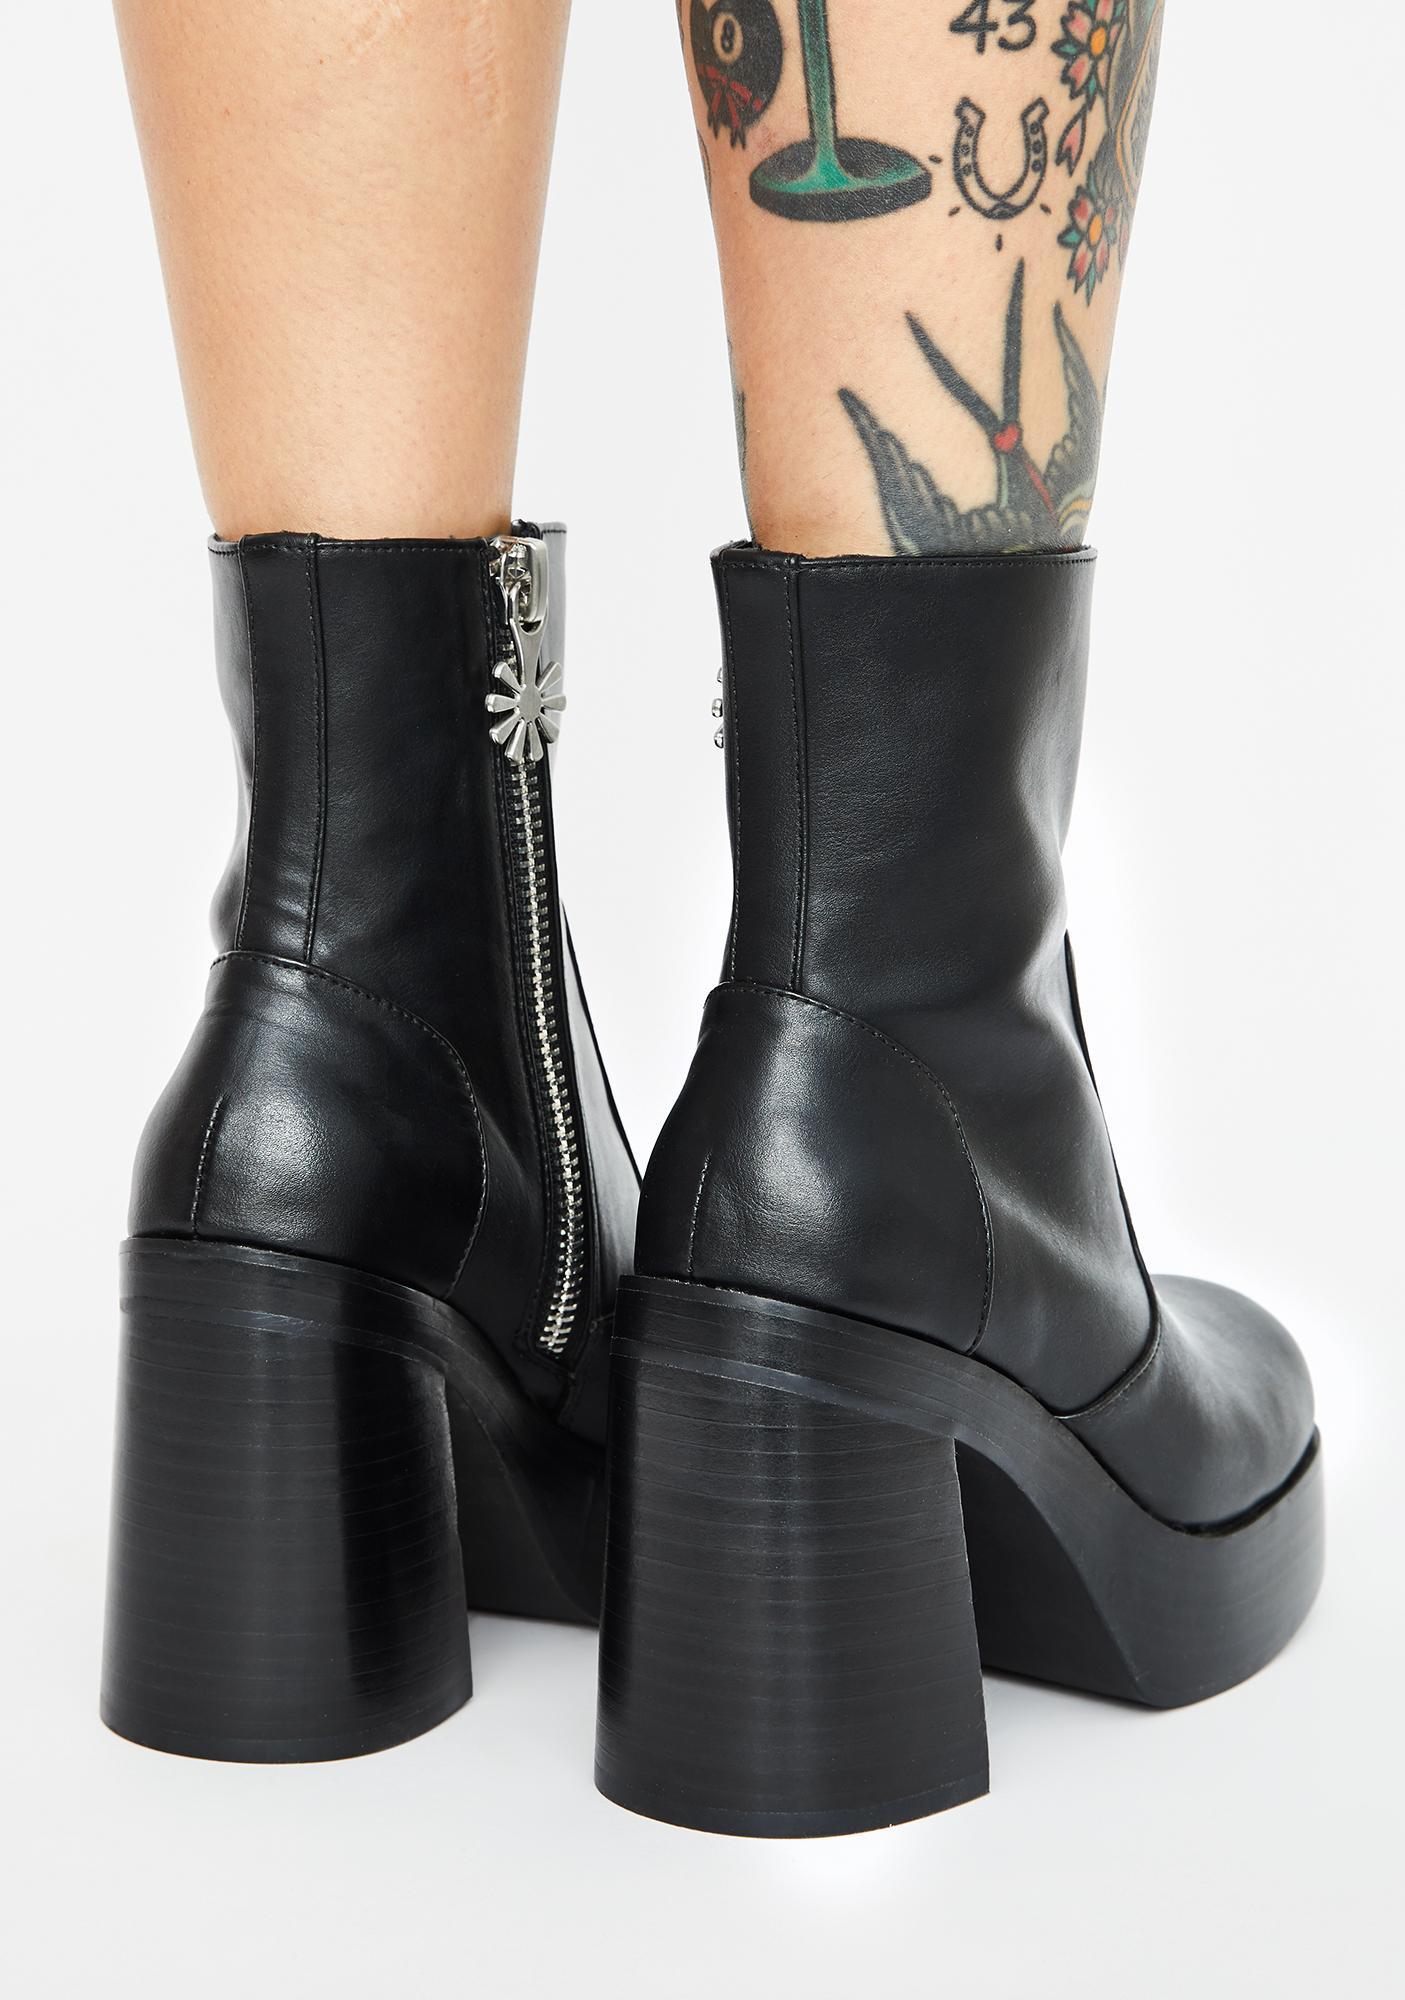 dELiA*s by Dolls Kill Chalkboard Confessions Platform Boots